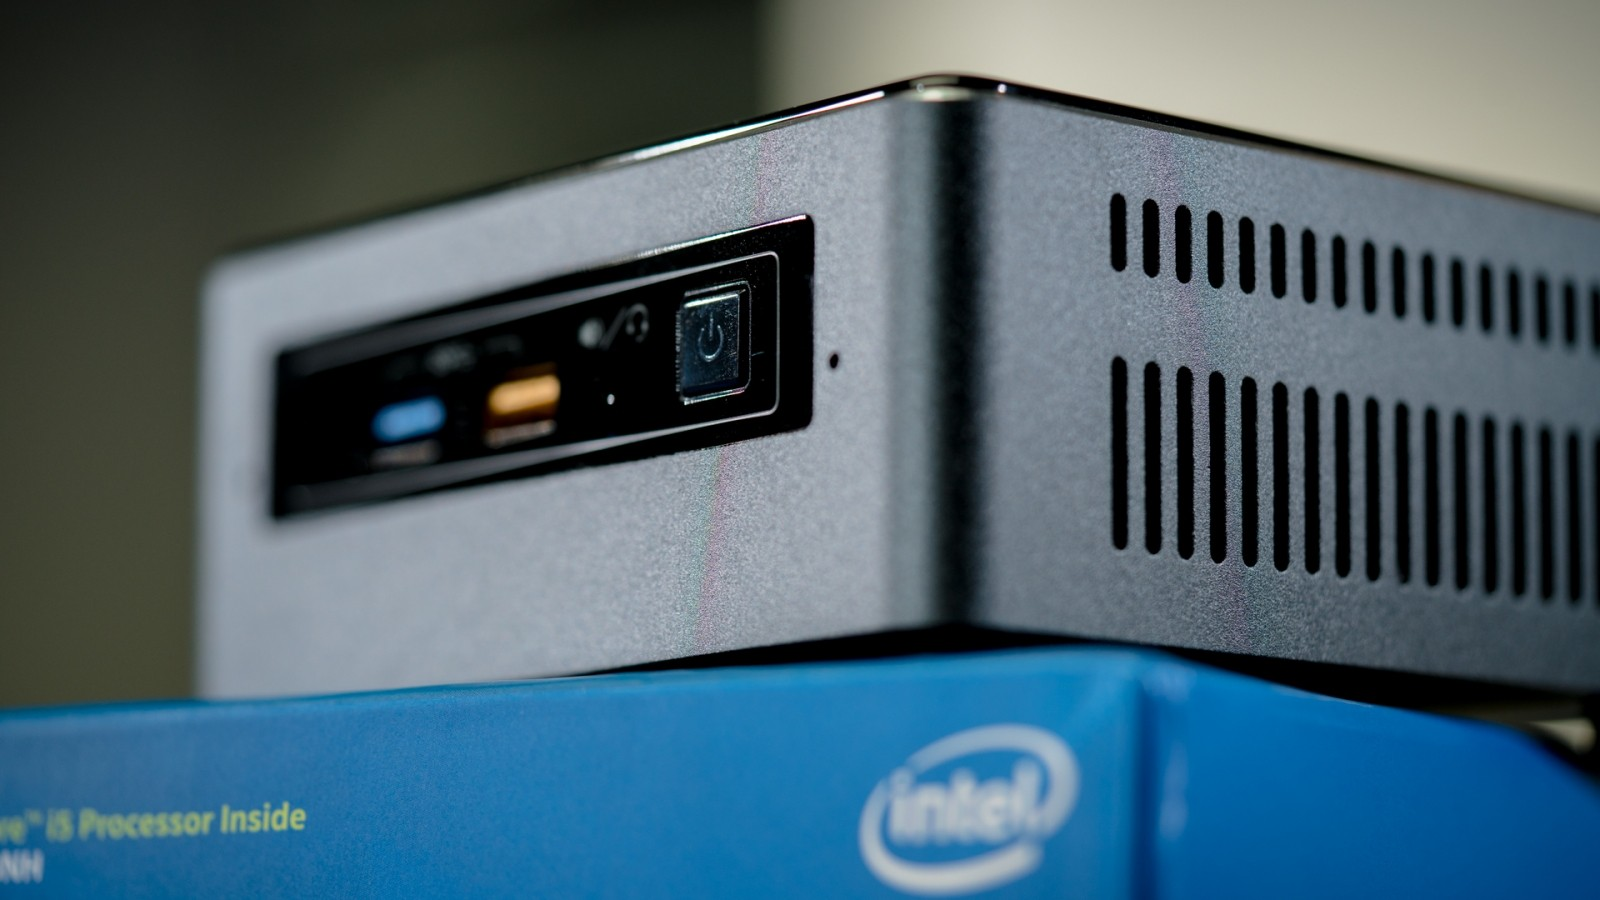 Intel NUC Kit BOXNUC8i5BEH3, With 8th Generation Core i5 8259U 2 3 GHz 3 8  GHz, Quad Core, 6MB Cac